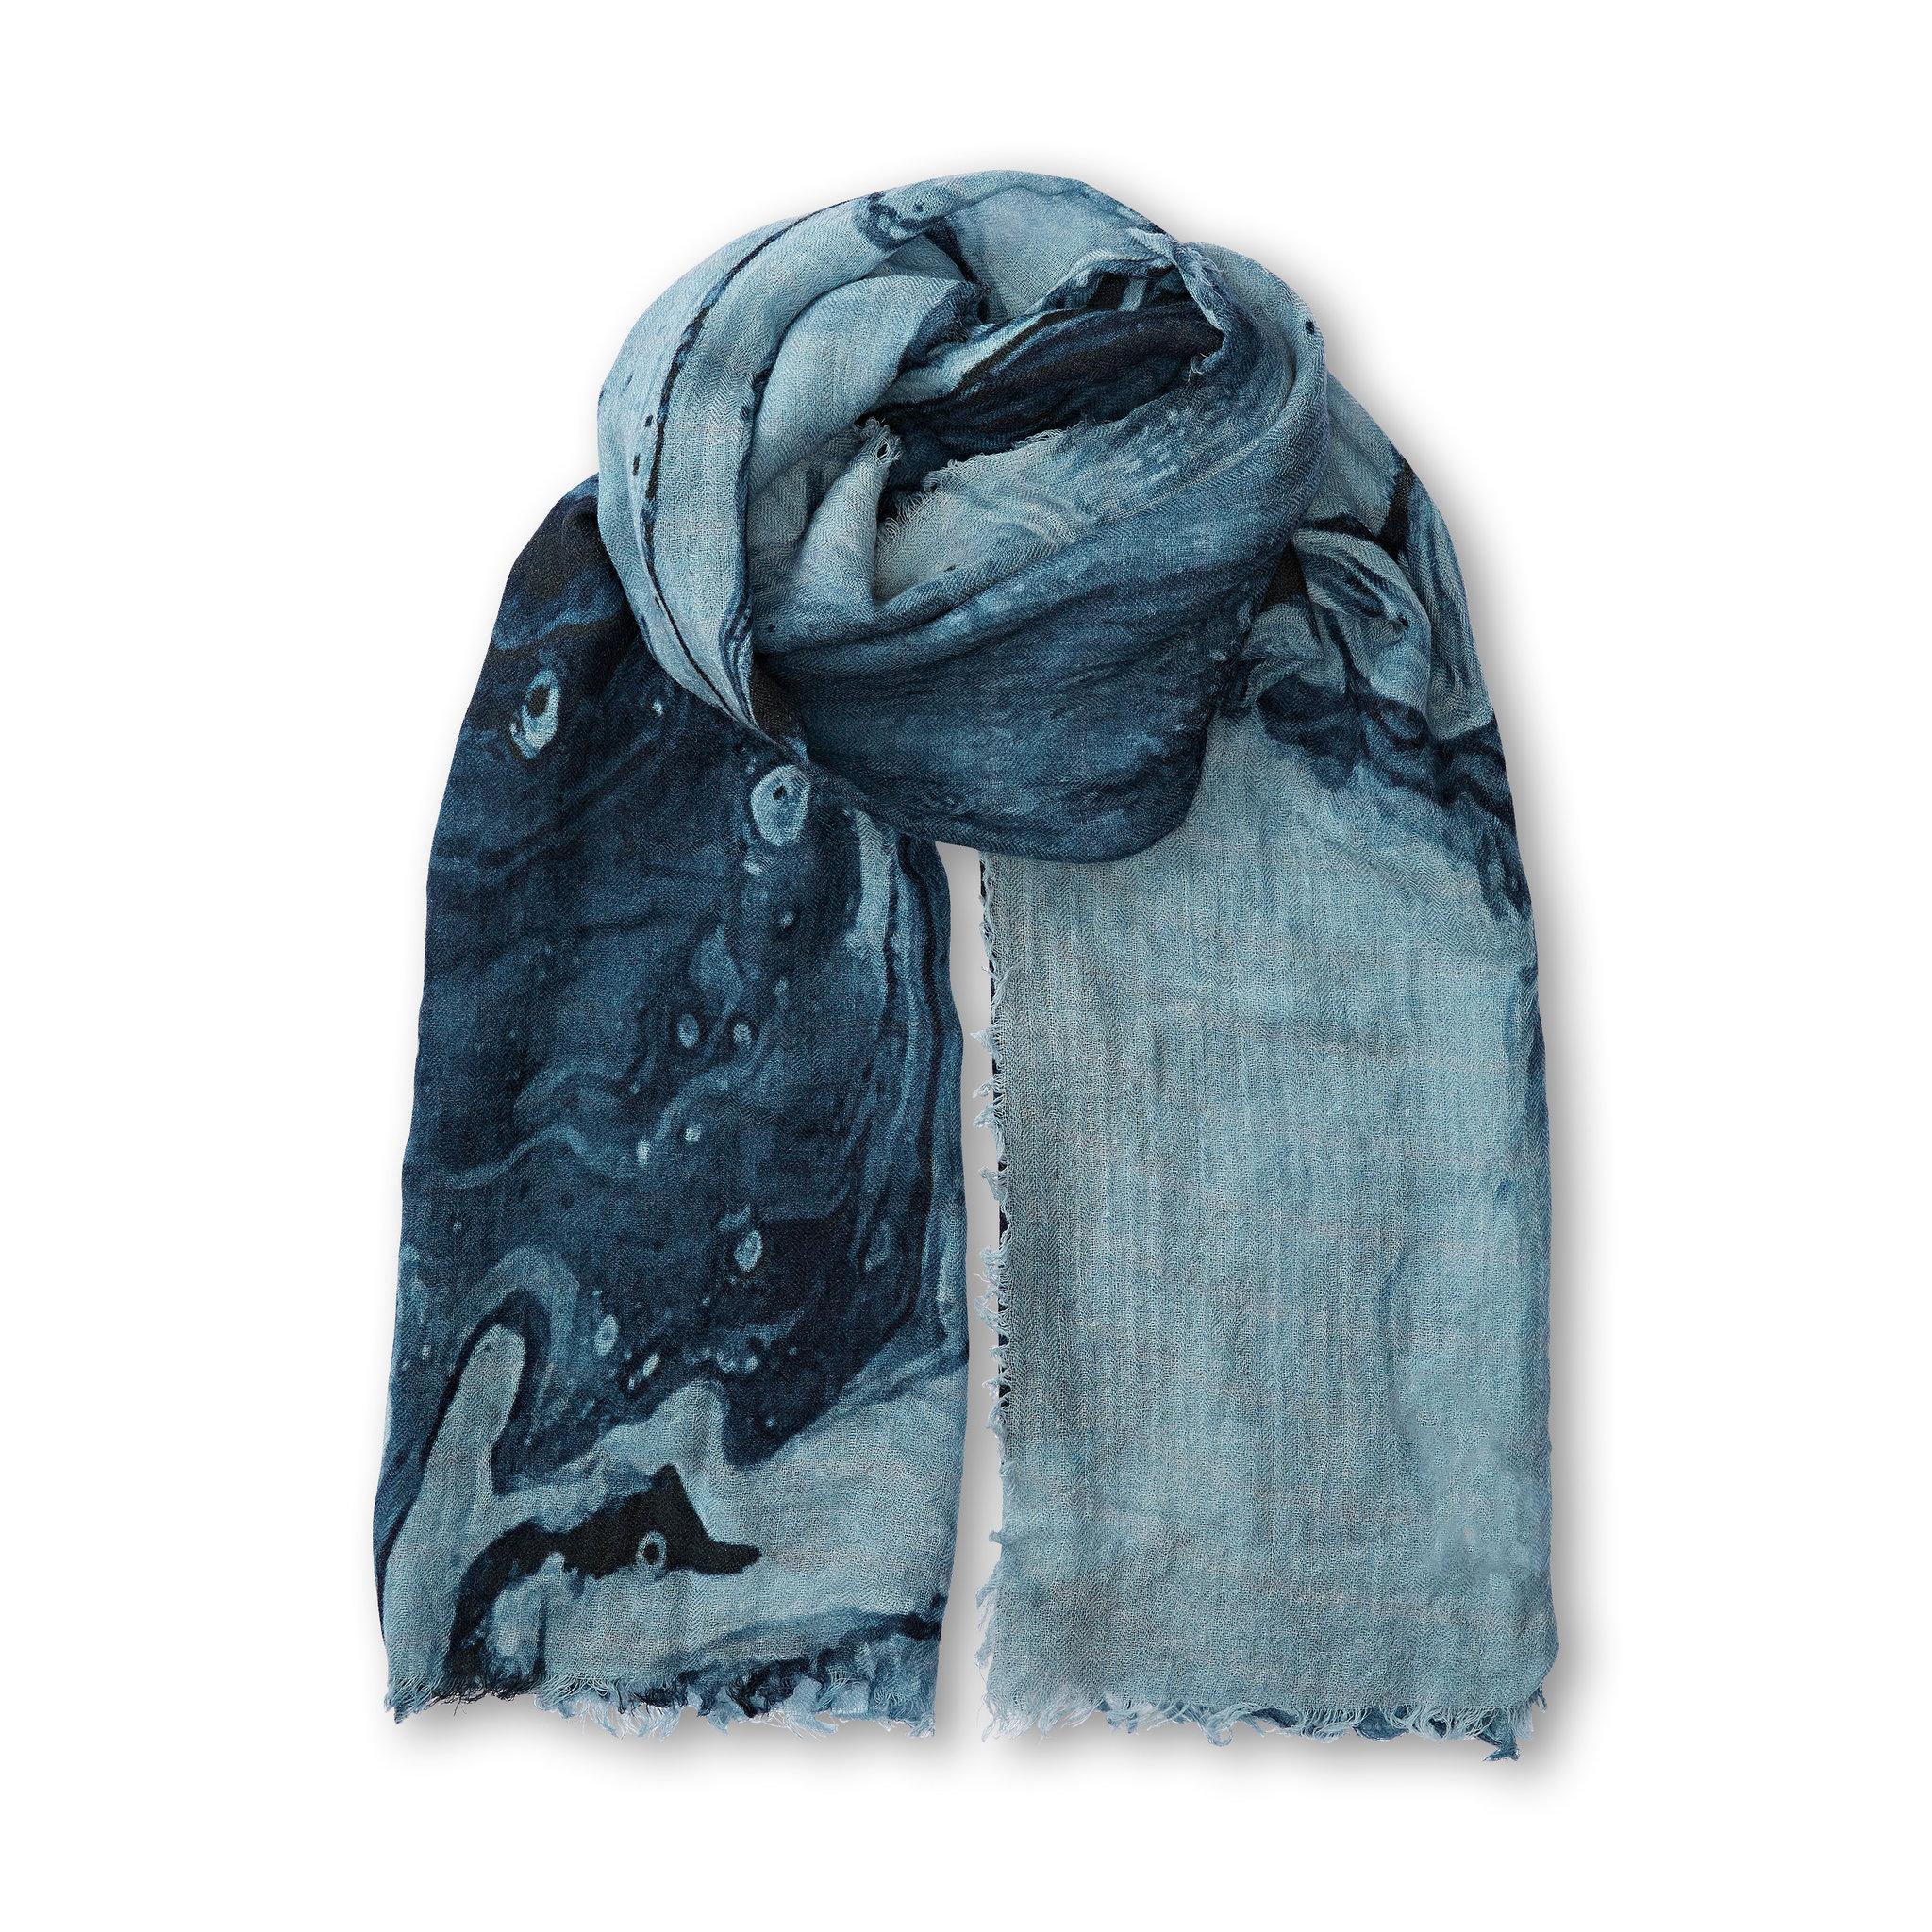 Scarf i ull - Halsdukar   scarves - Köp online på åhlens.se! 997715faf444e